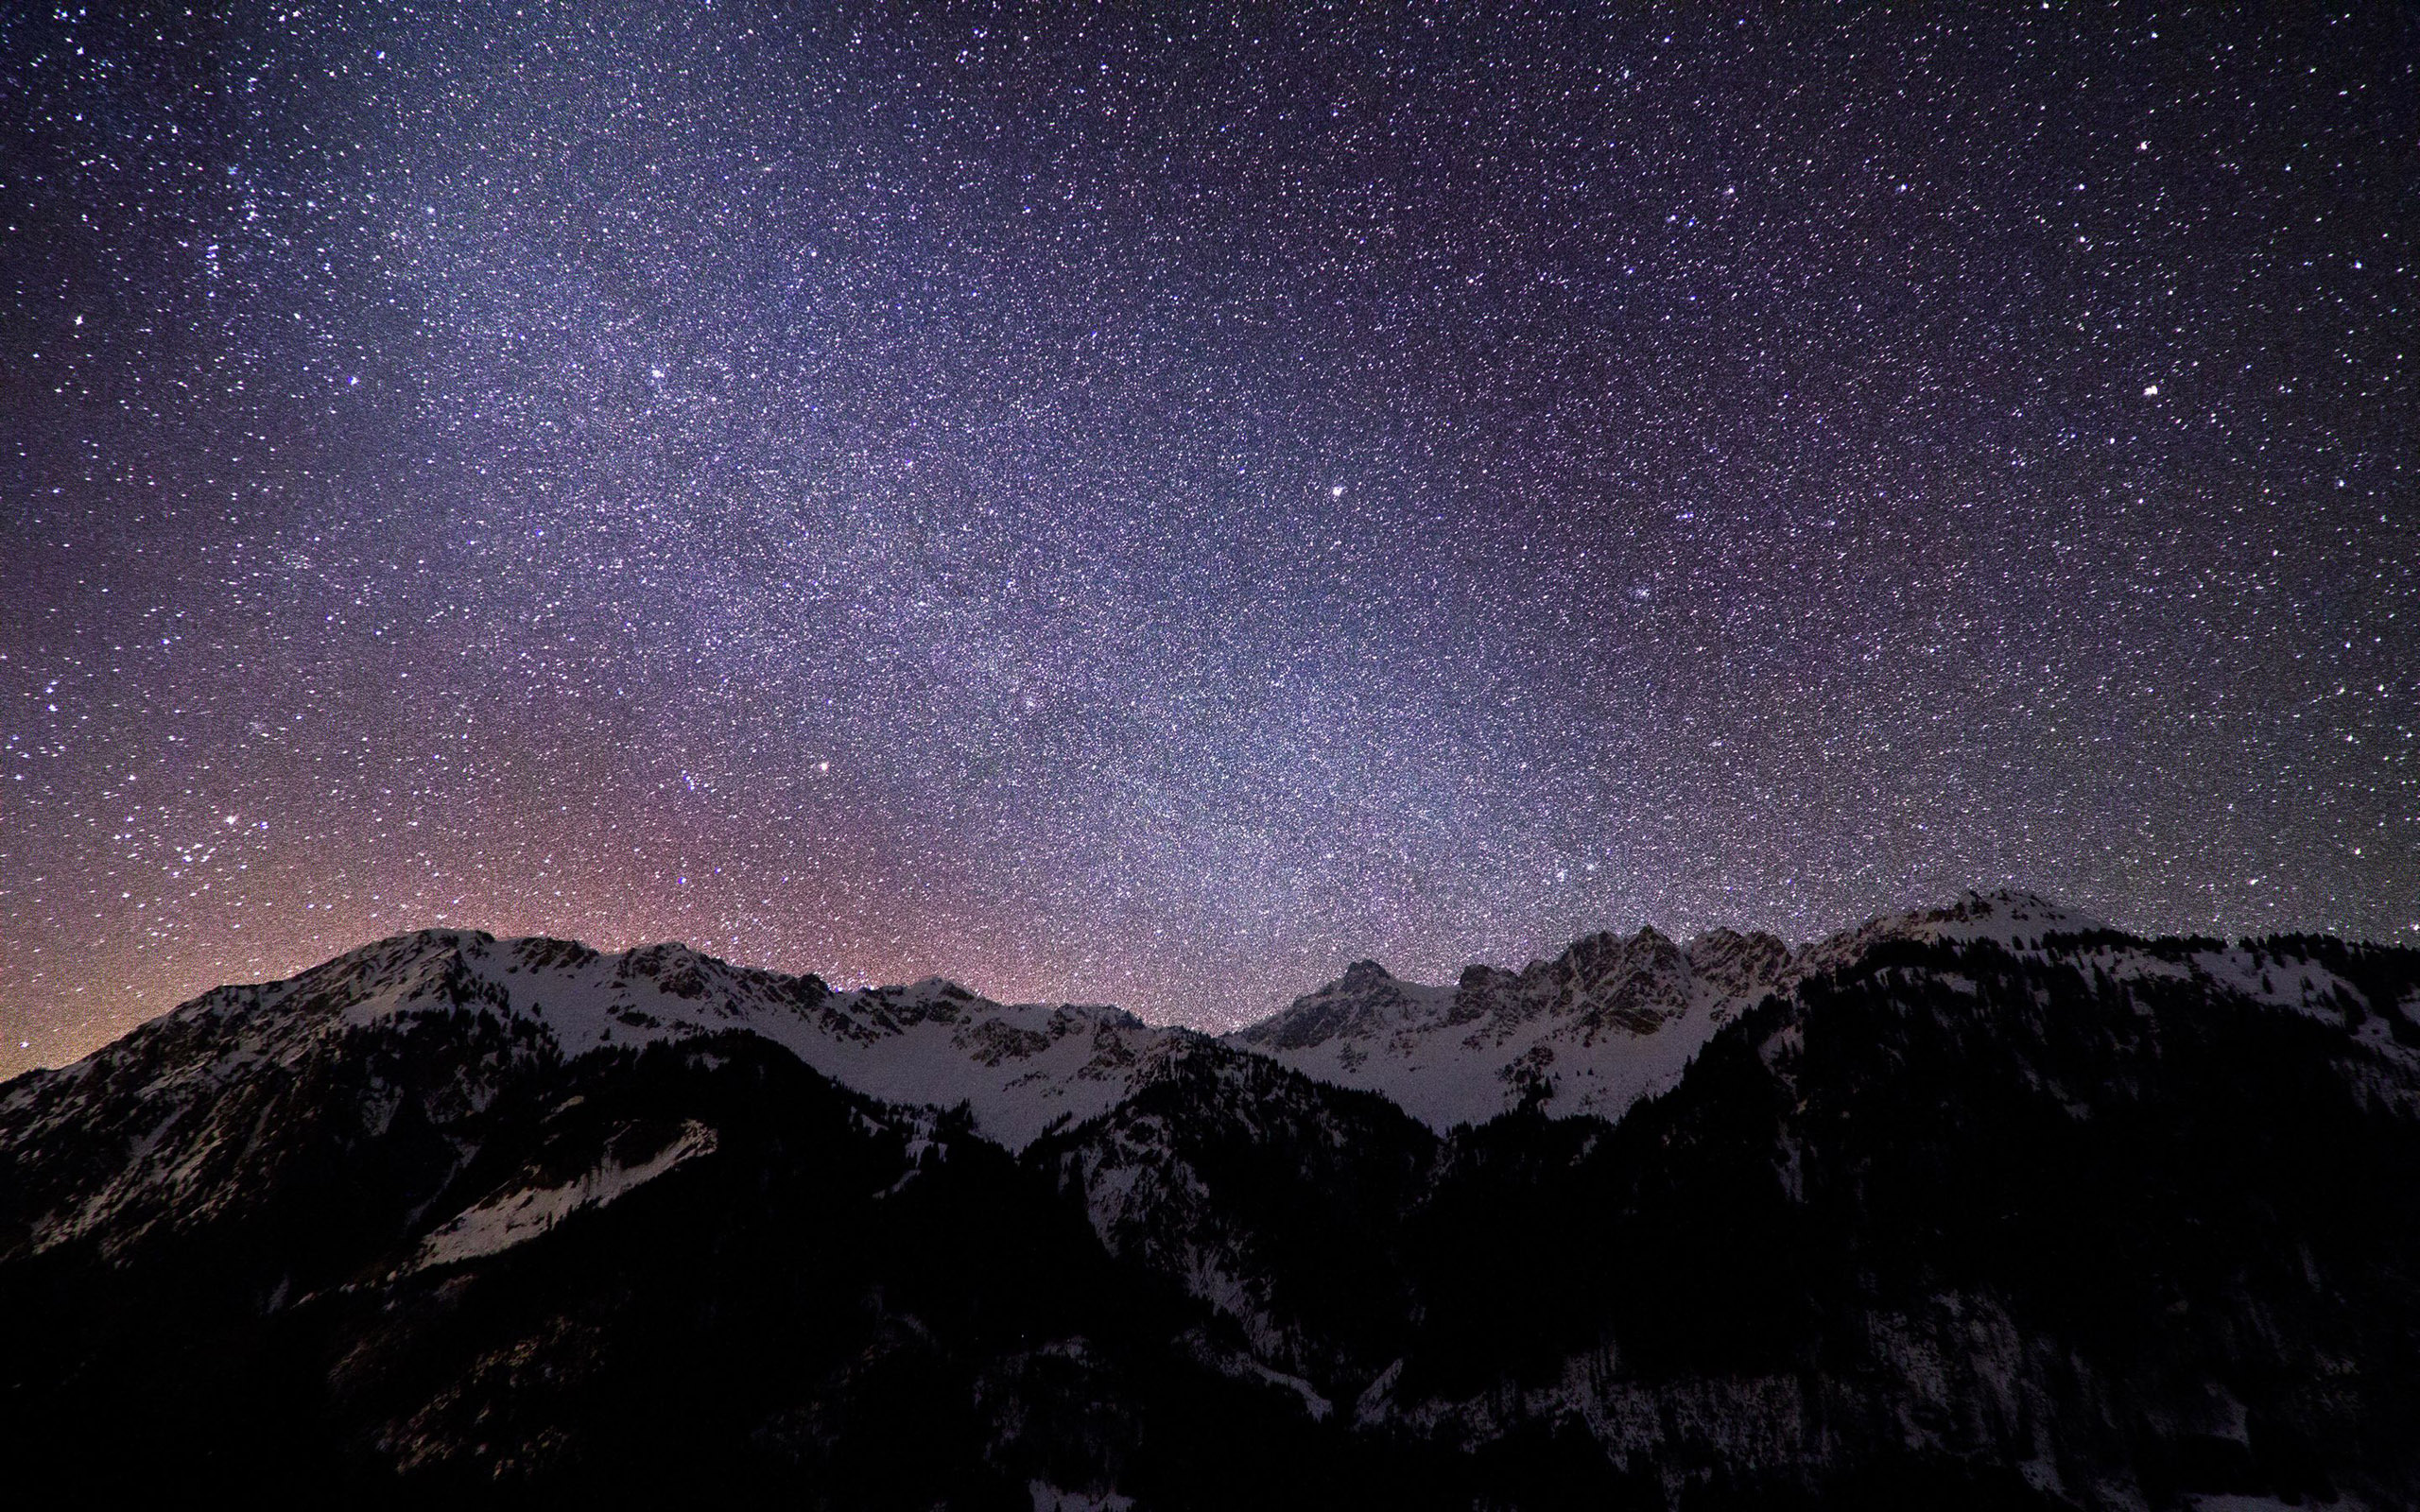 Night lights in the sky wallpaper 17049 2560x1600